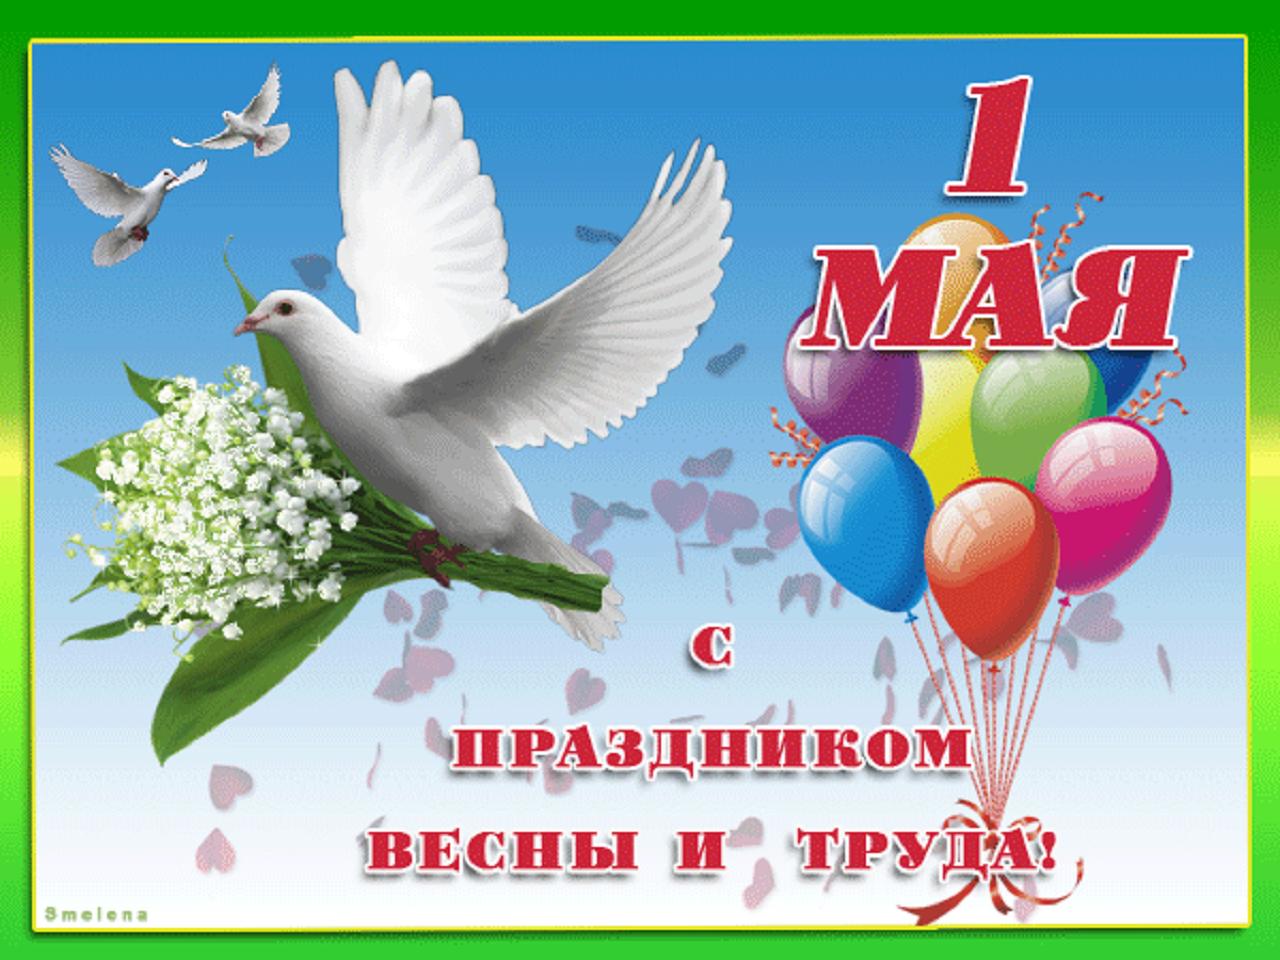 Vivat_1_may